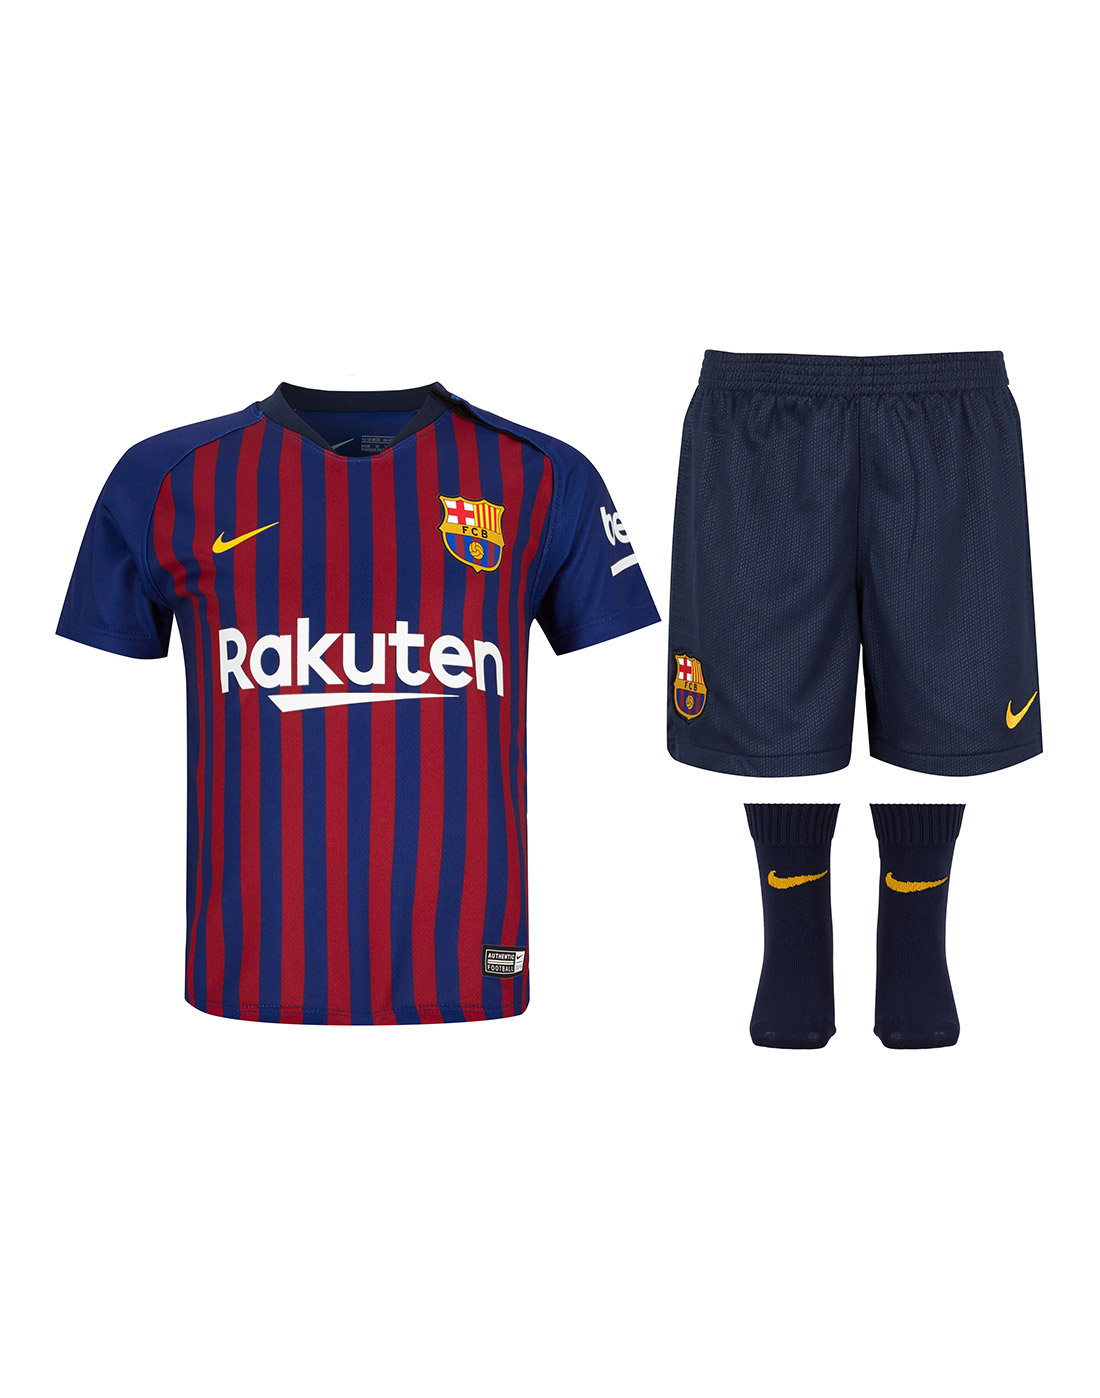 382c1f6c5 Infants Barcelona 18 19 Home Kit ...